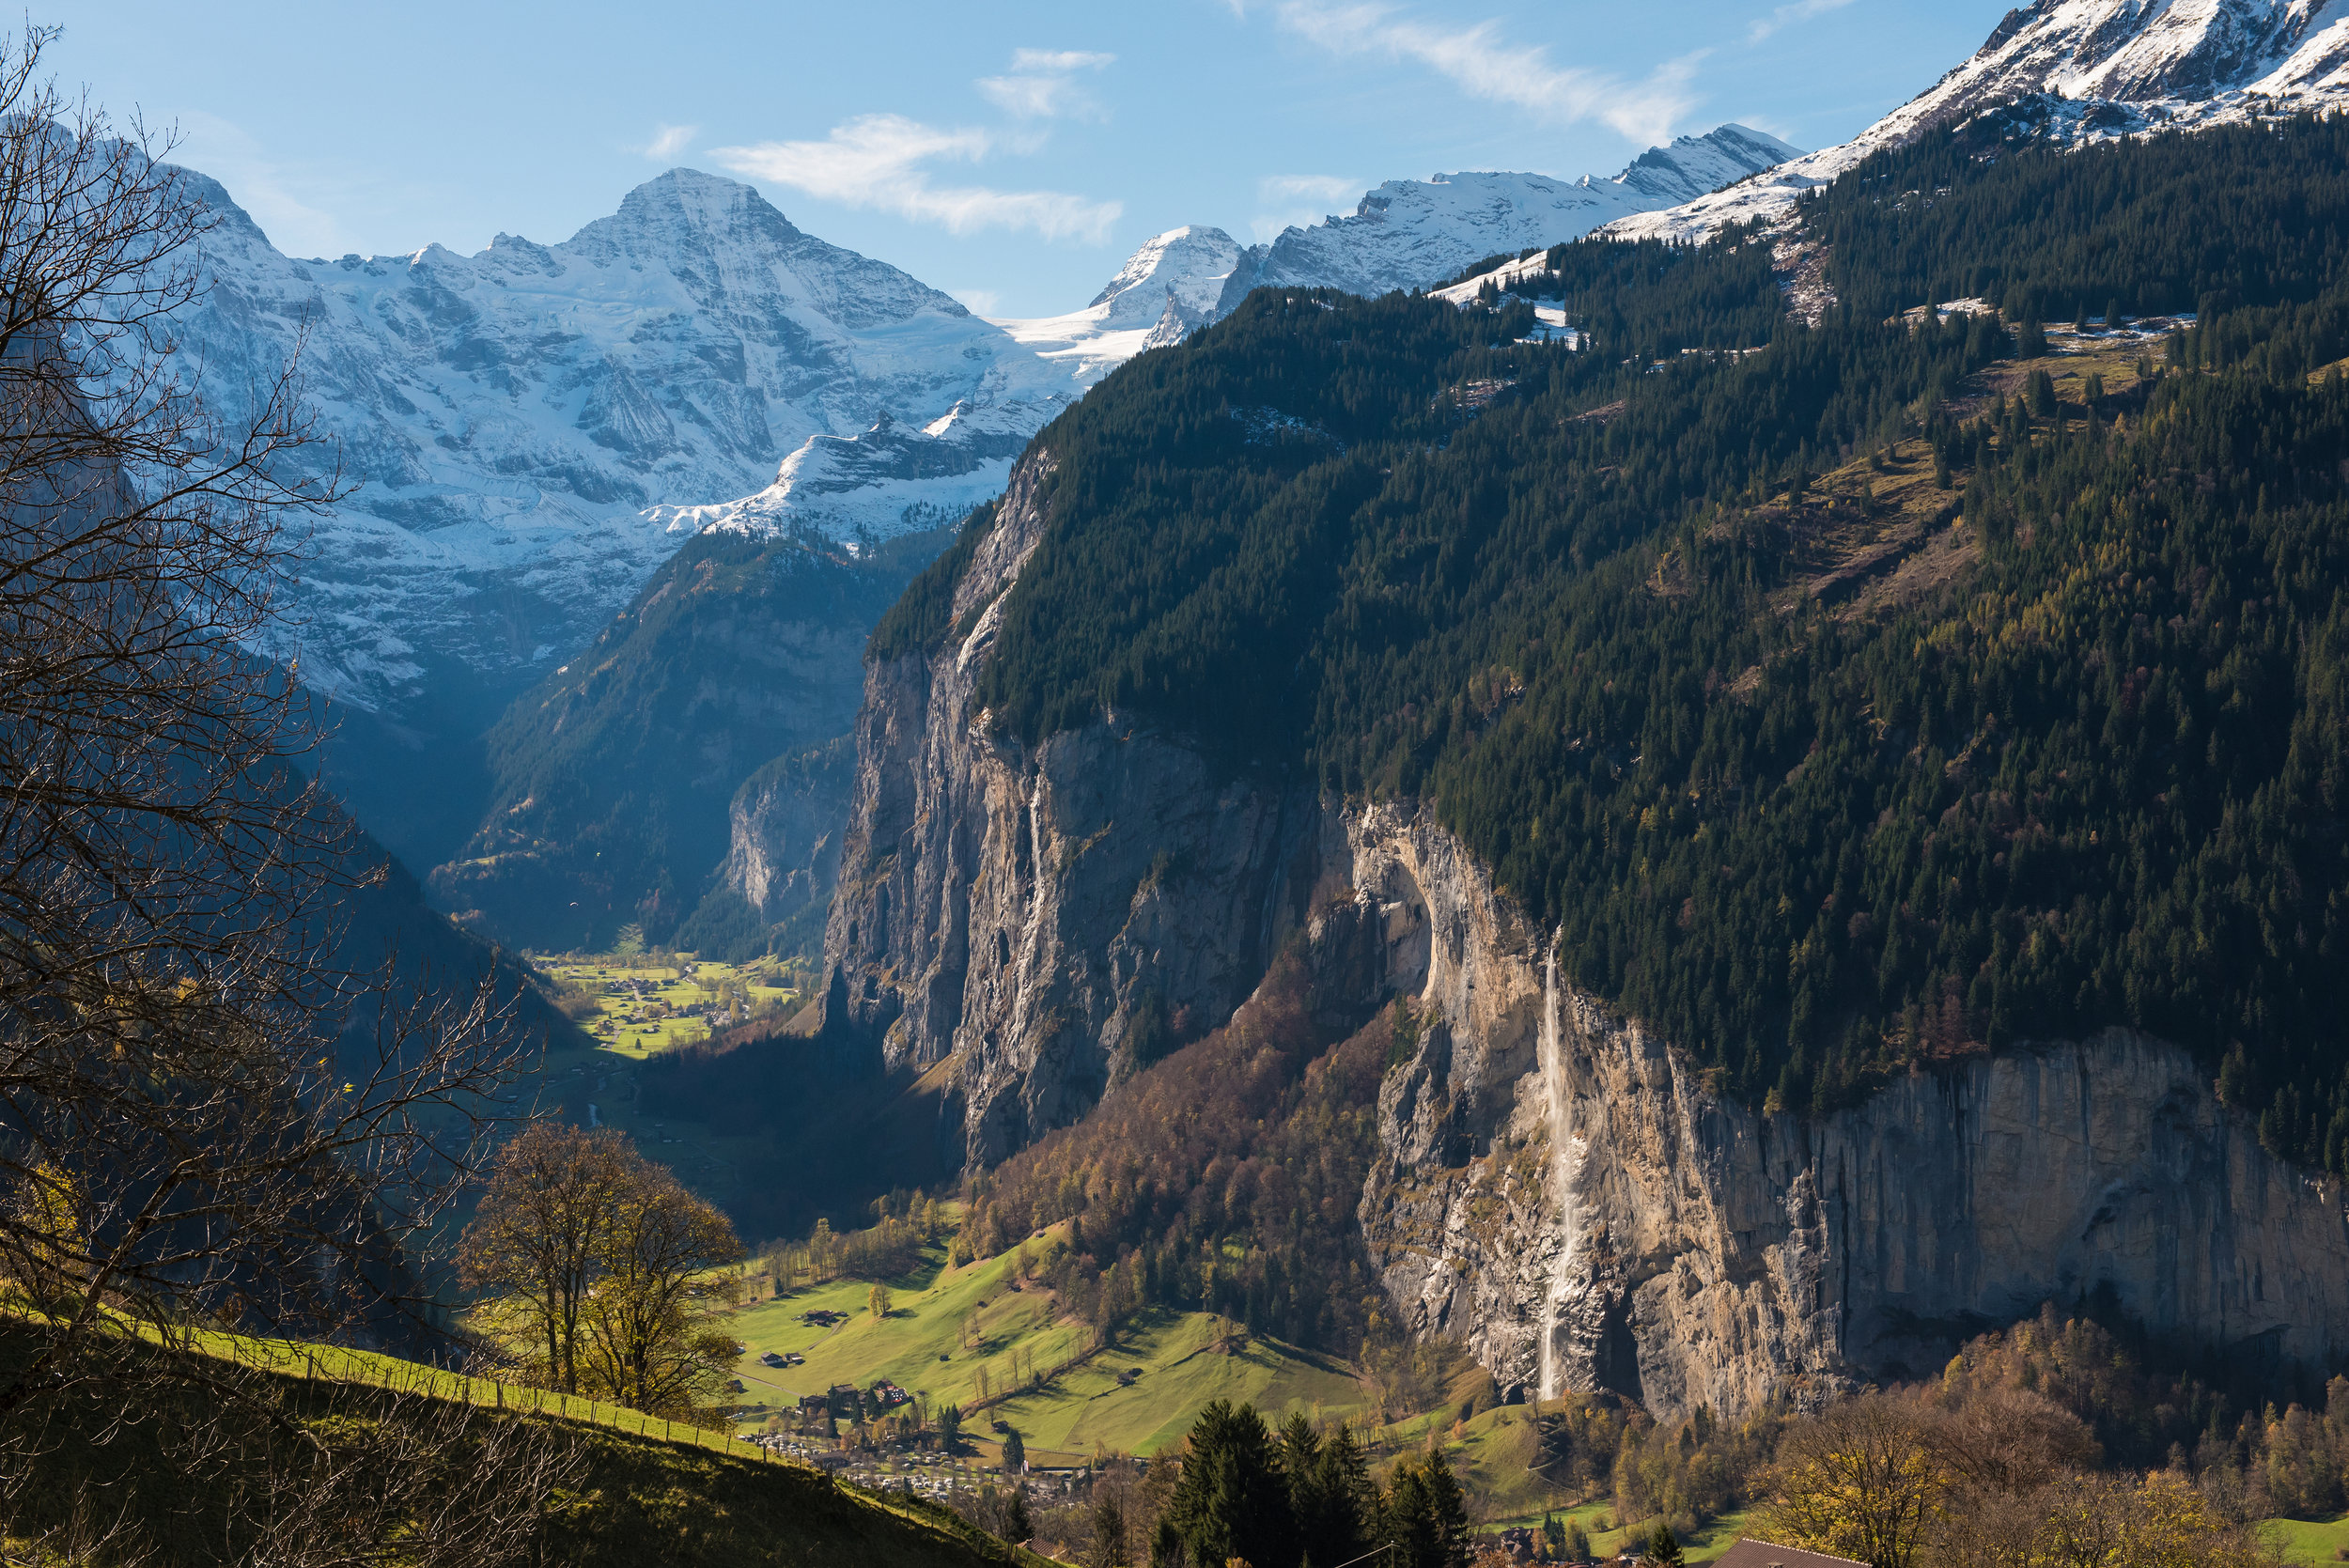 Vacation in Switzerland - NJ wedding photographer00569.jpg